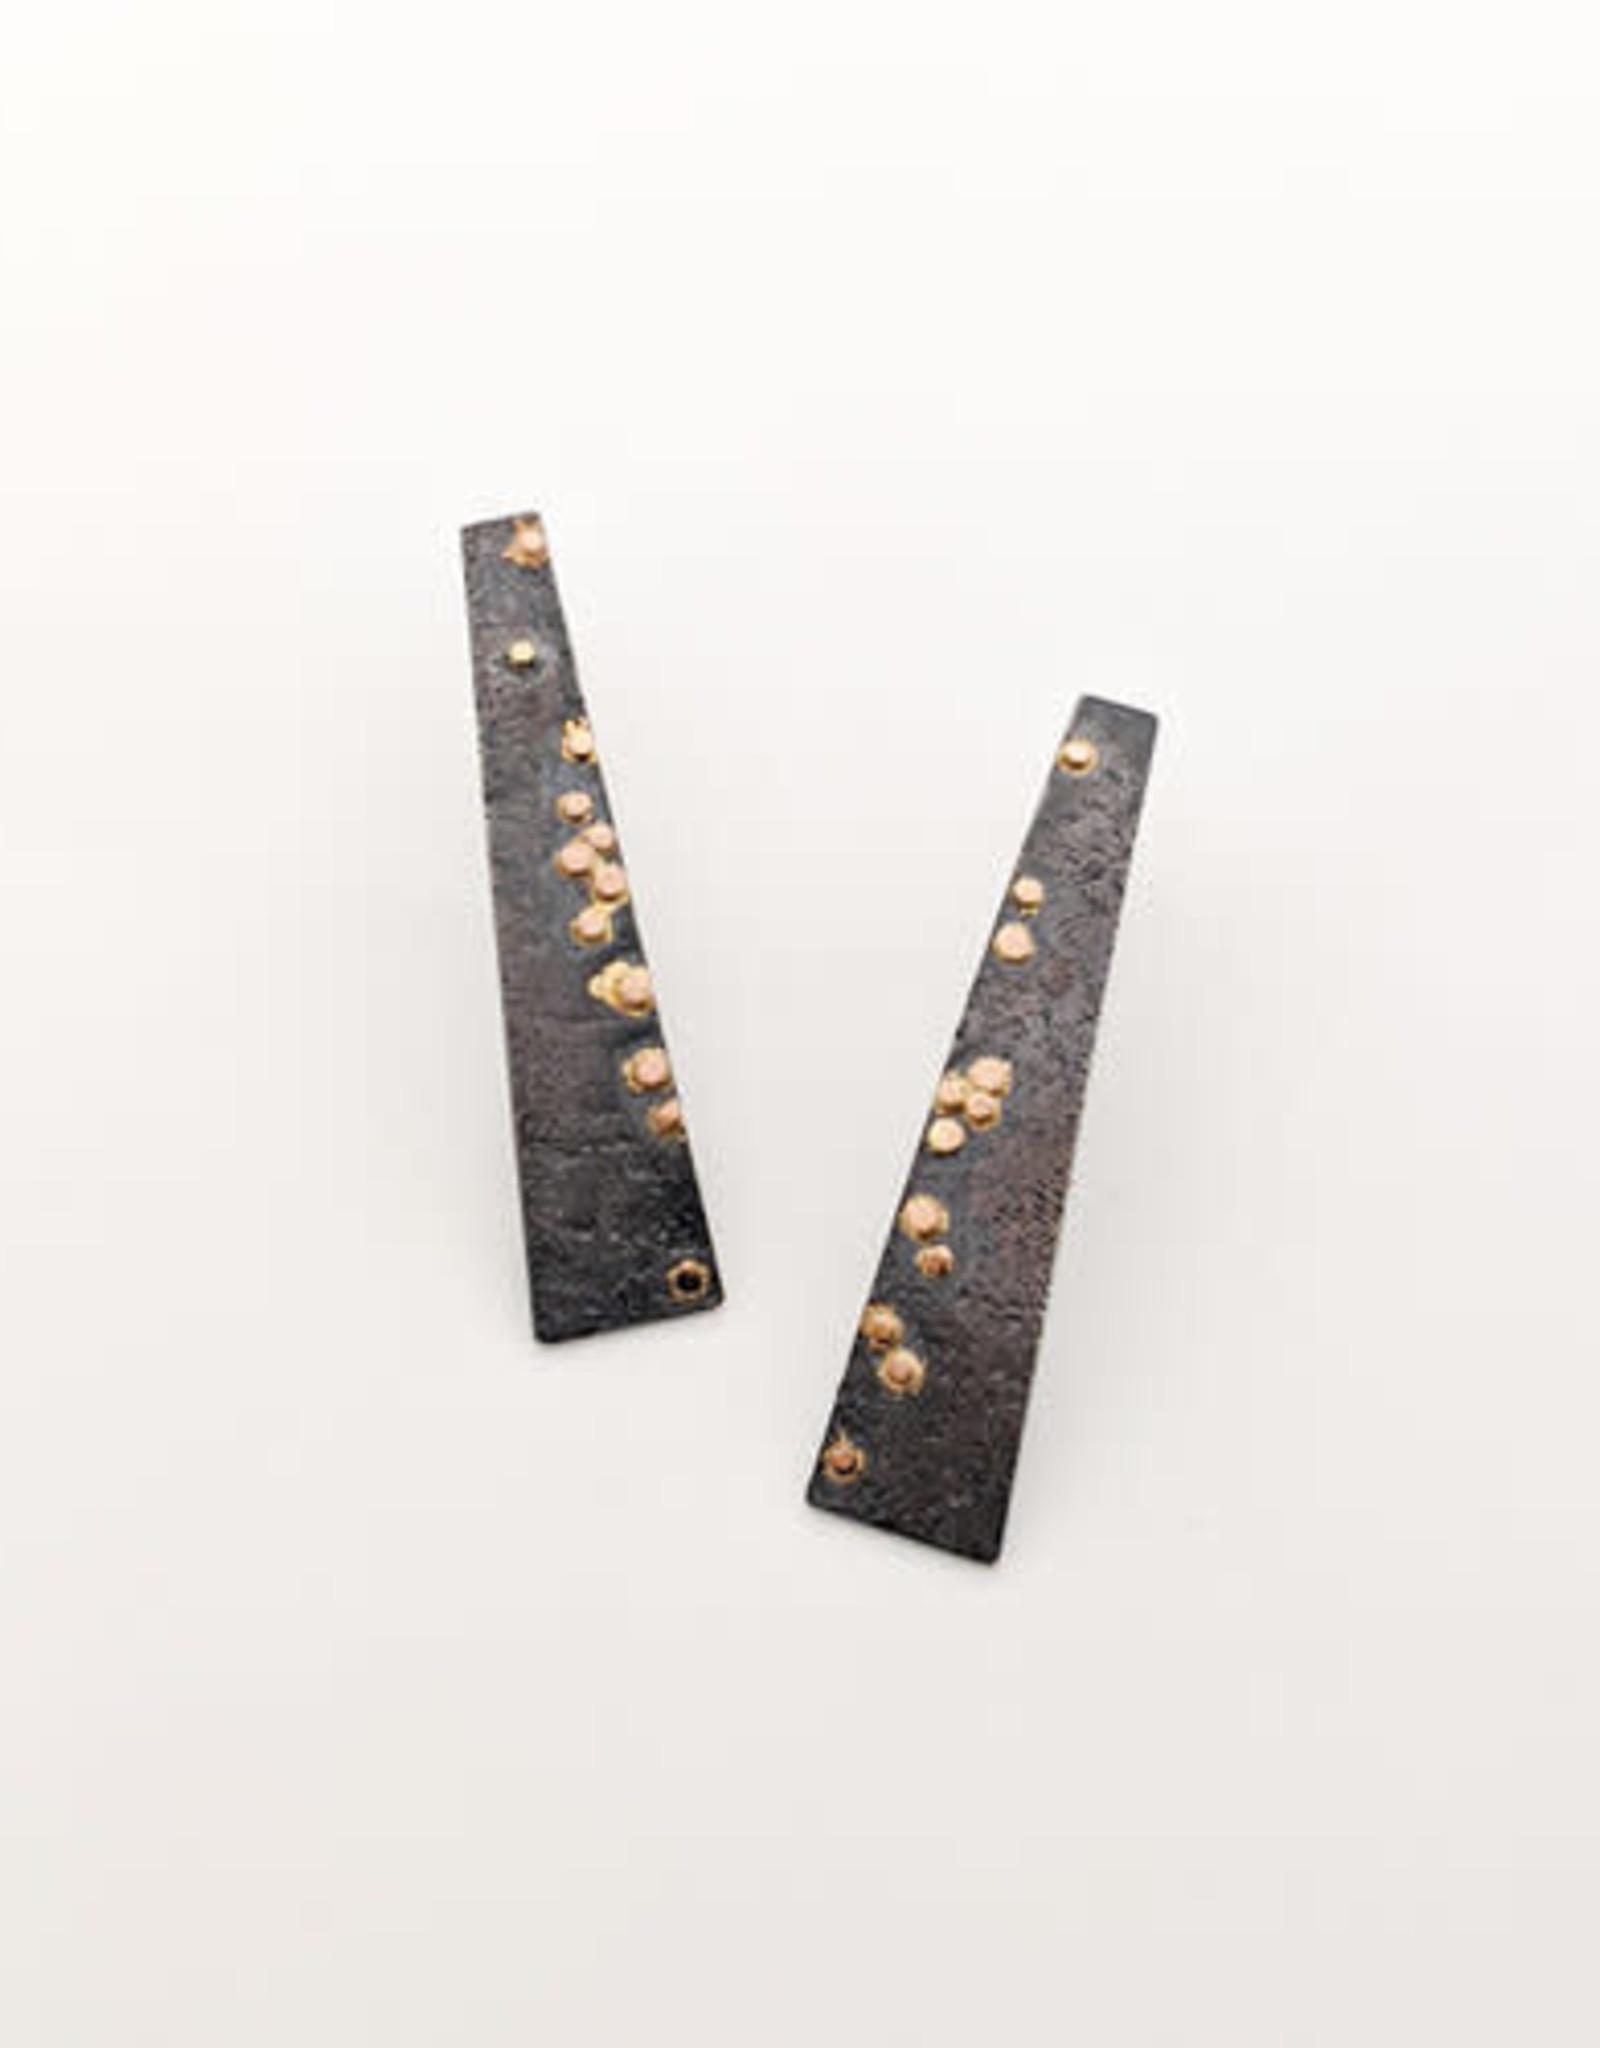 Rocky Pardo Jewelry Estrella Long Studs